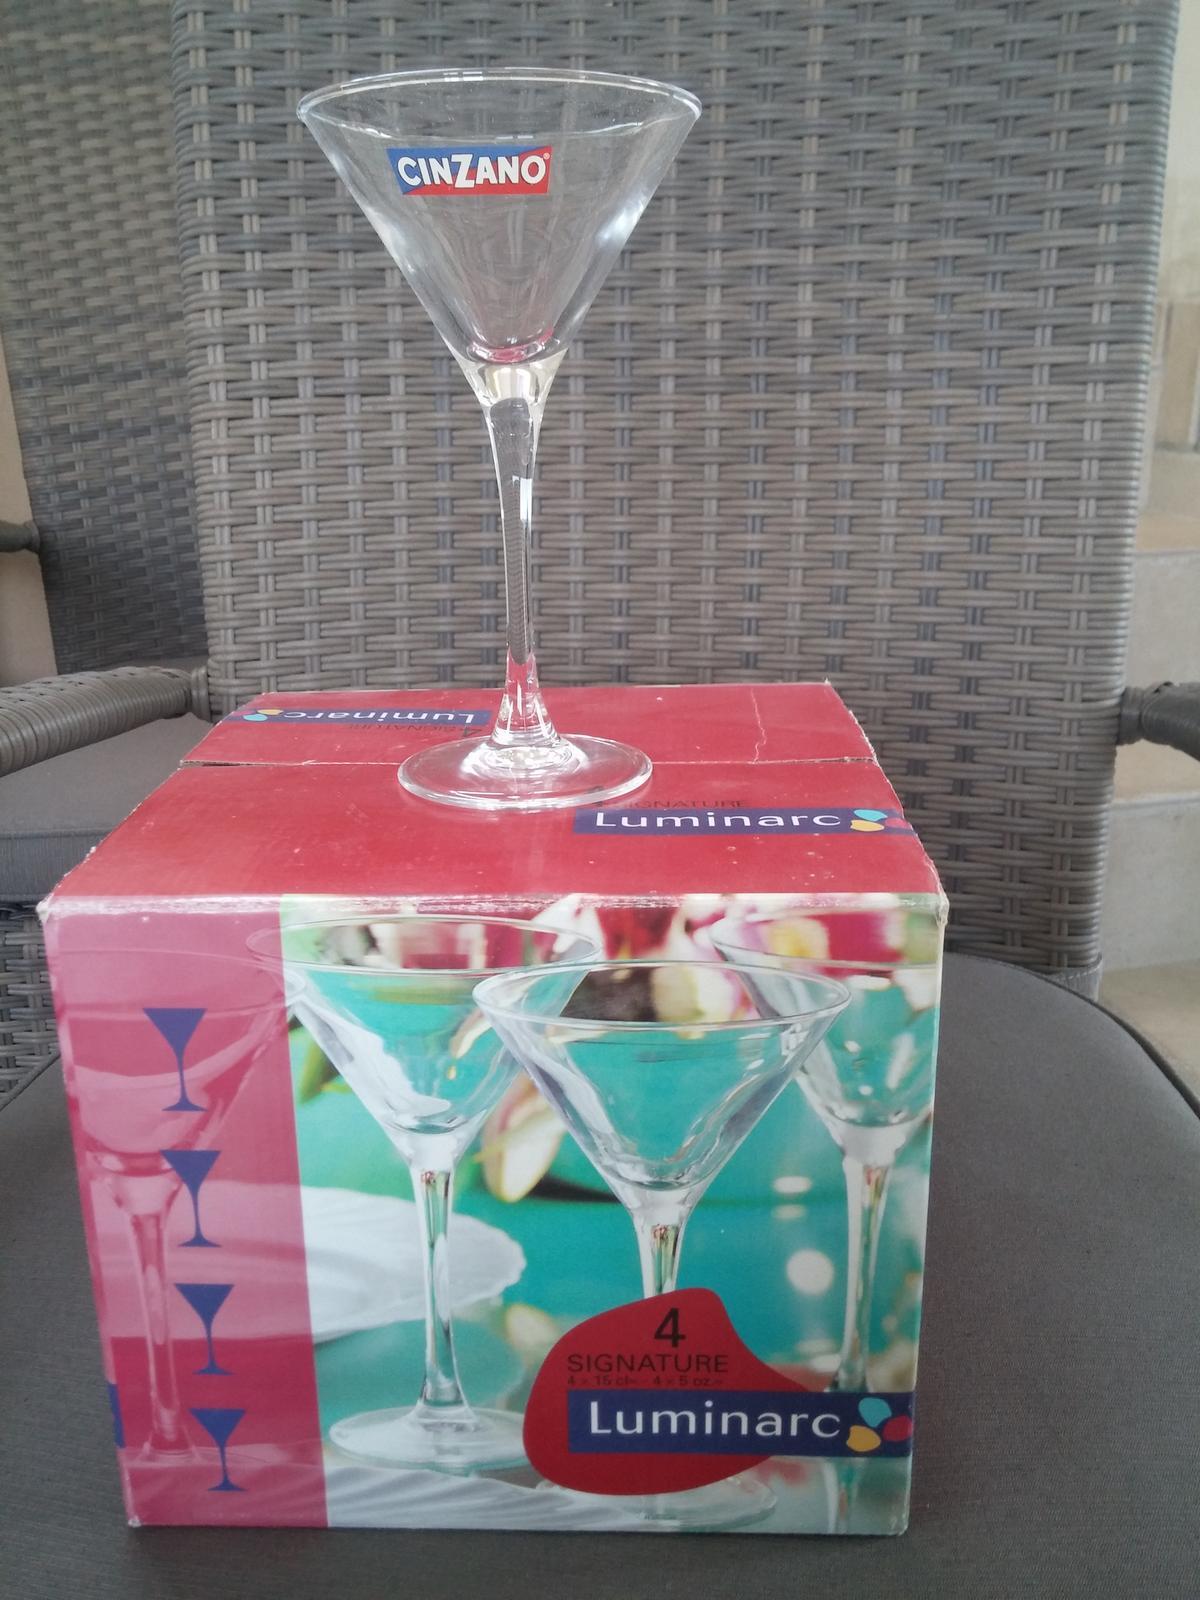 poháre cinzano - Obrázok č. 1